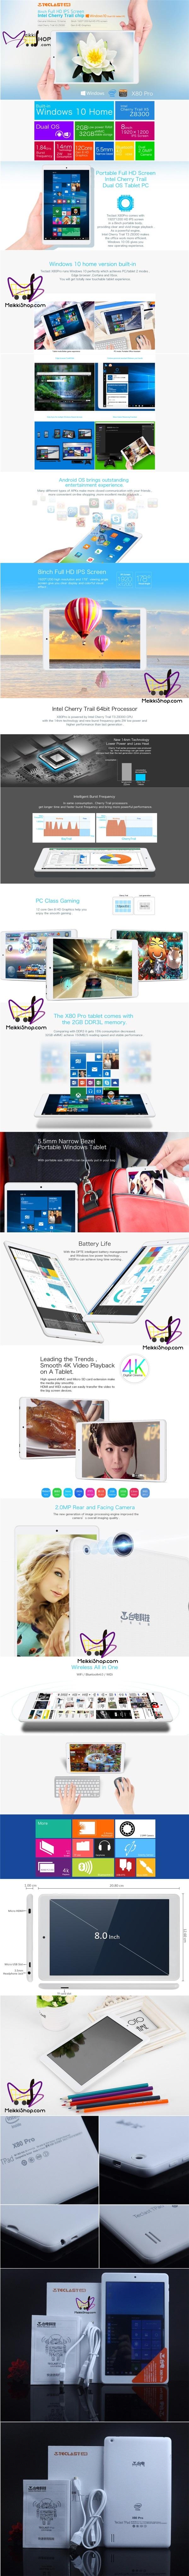 Teclast X80 Pro.jpg